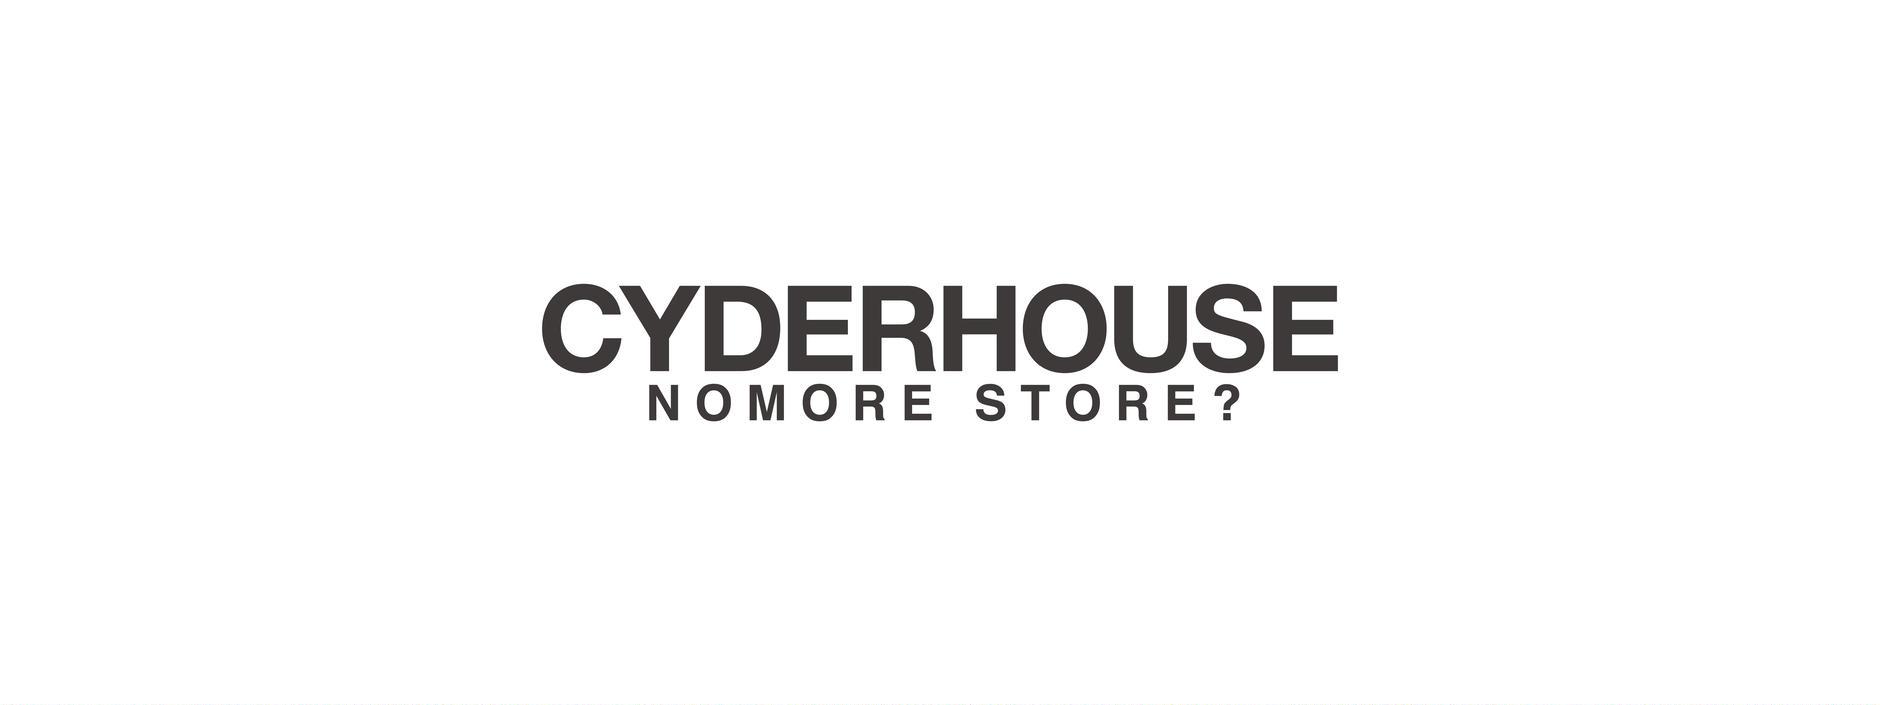 CYDERHOUSE